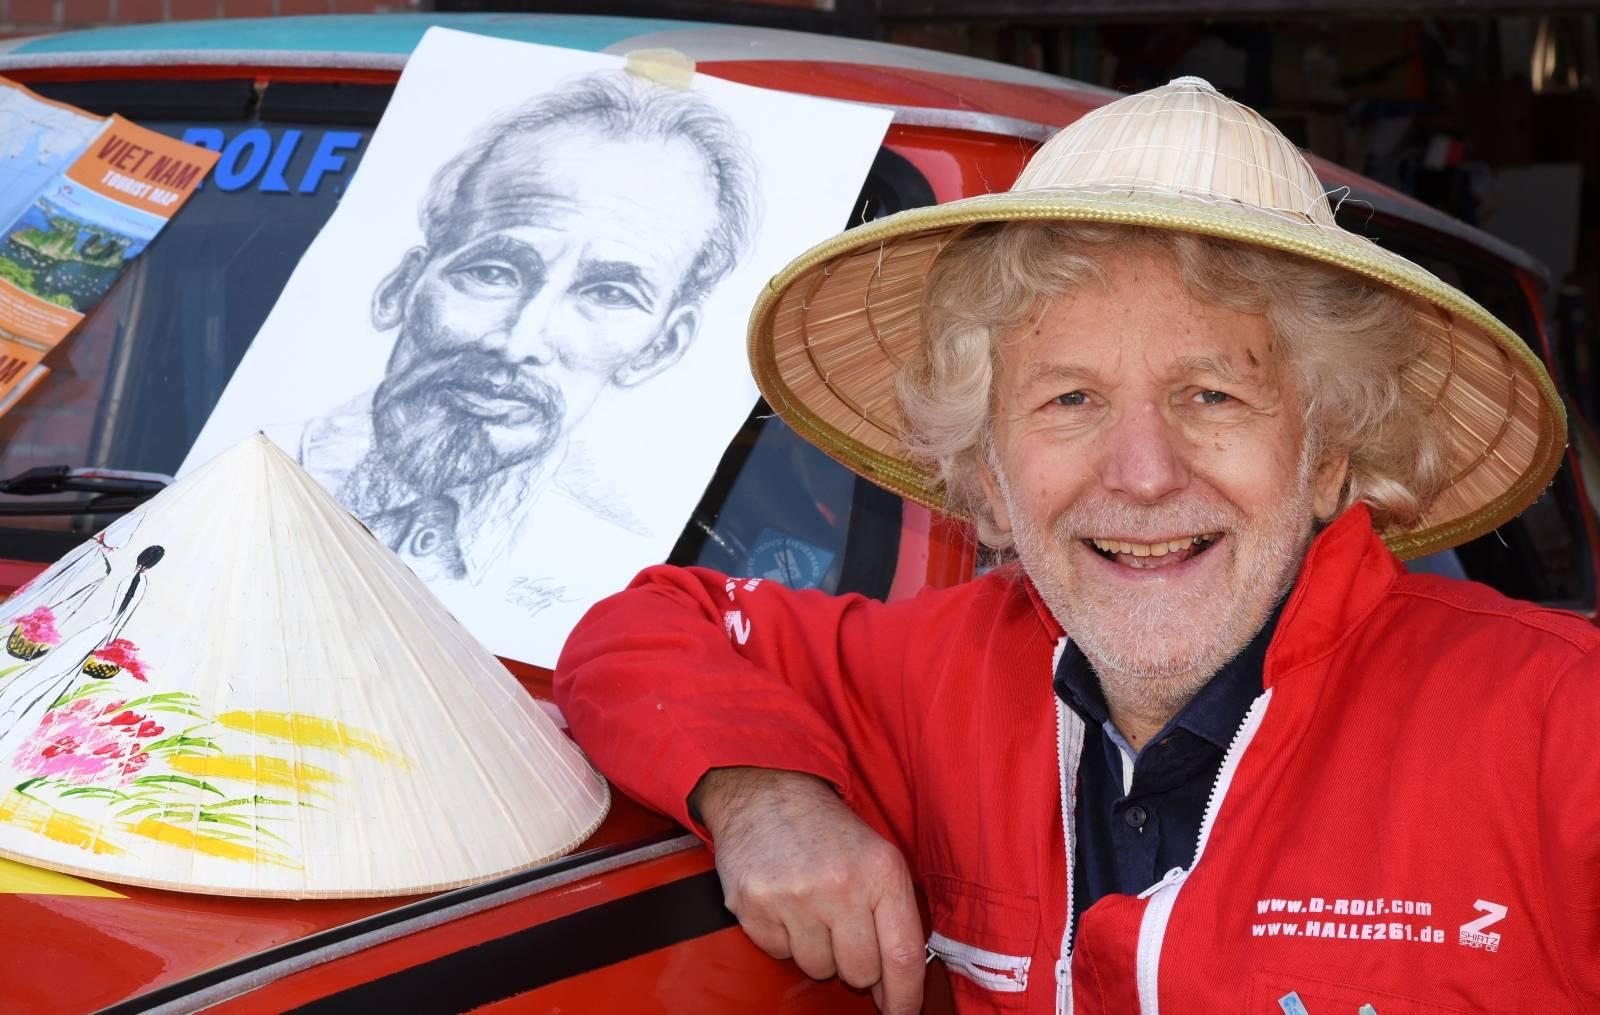 Drehorgel-Rolf prepares trip to Vietnam with Trabi